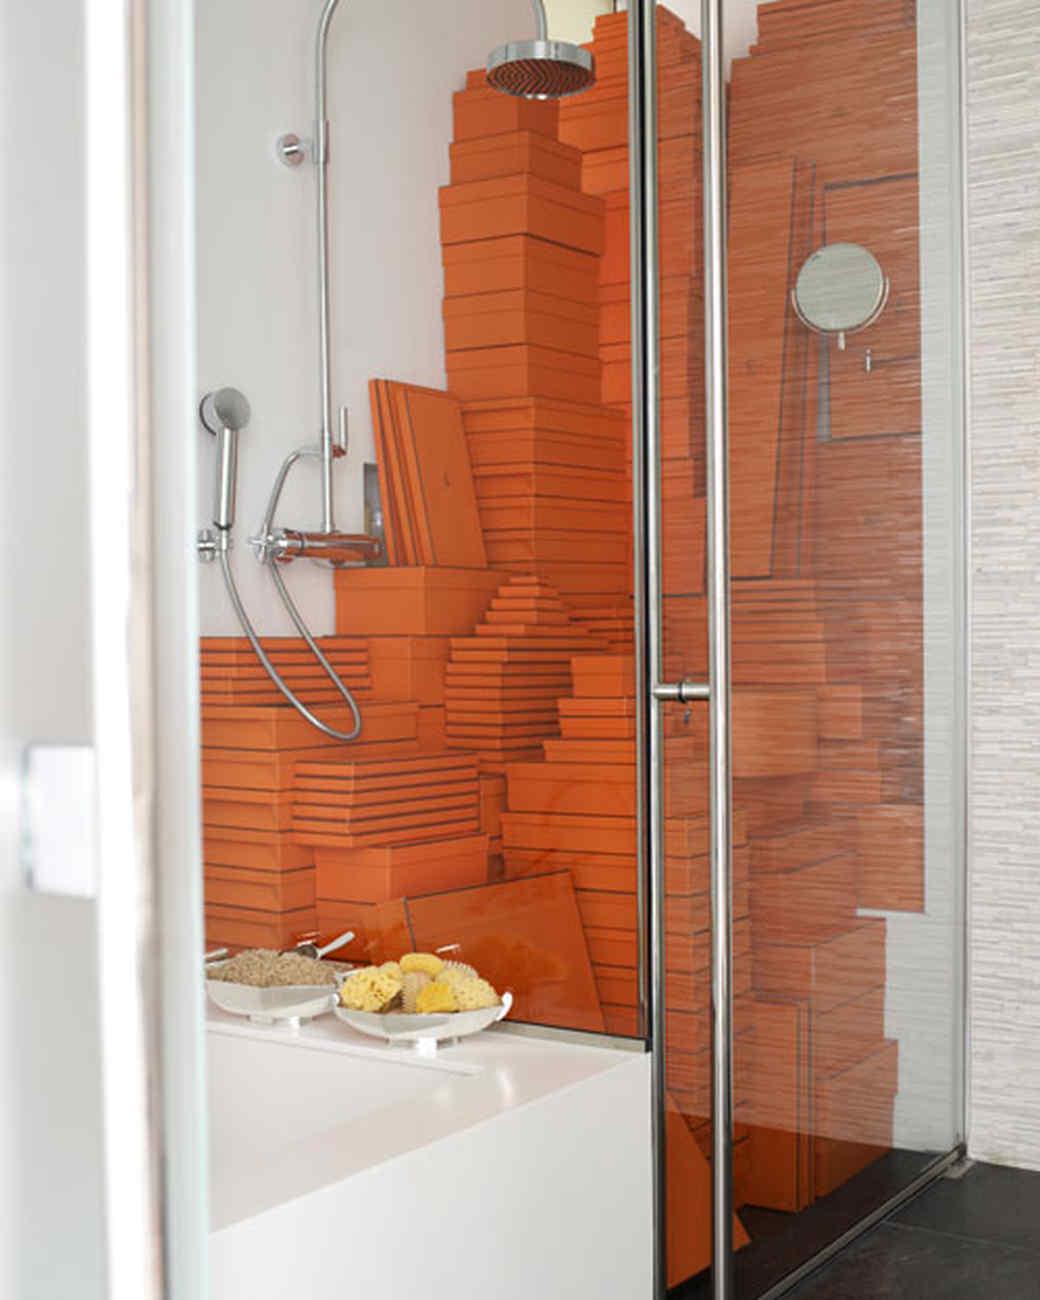 mld106055_0610_sharkeybathroom.jpg